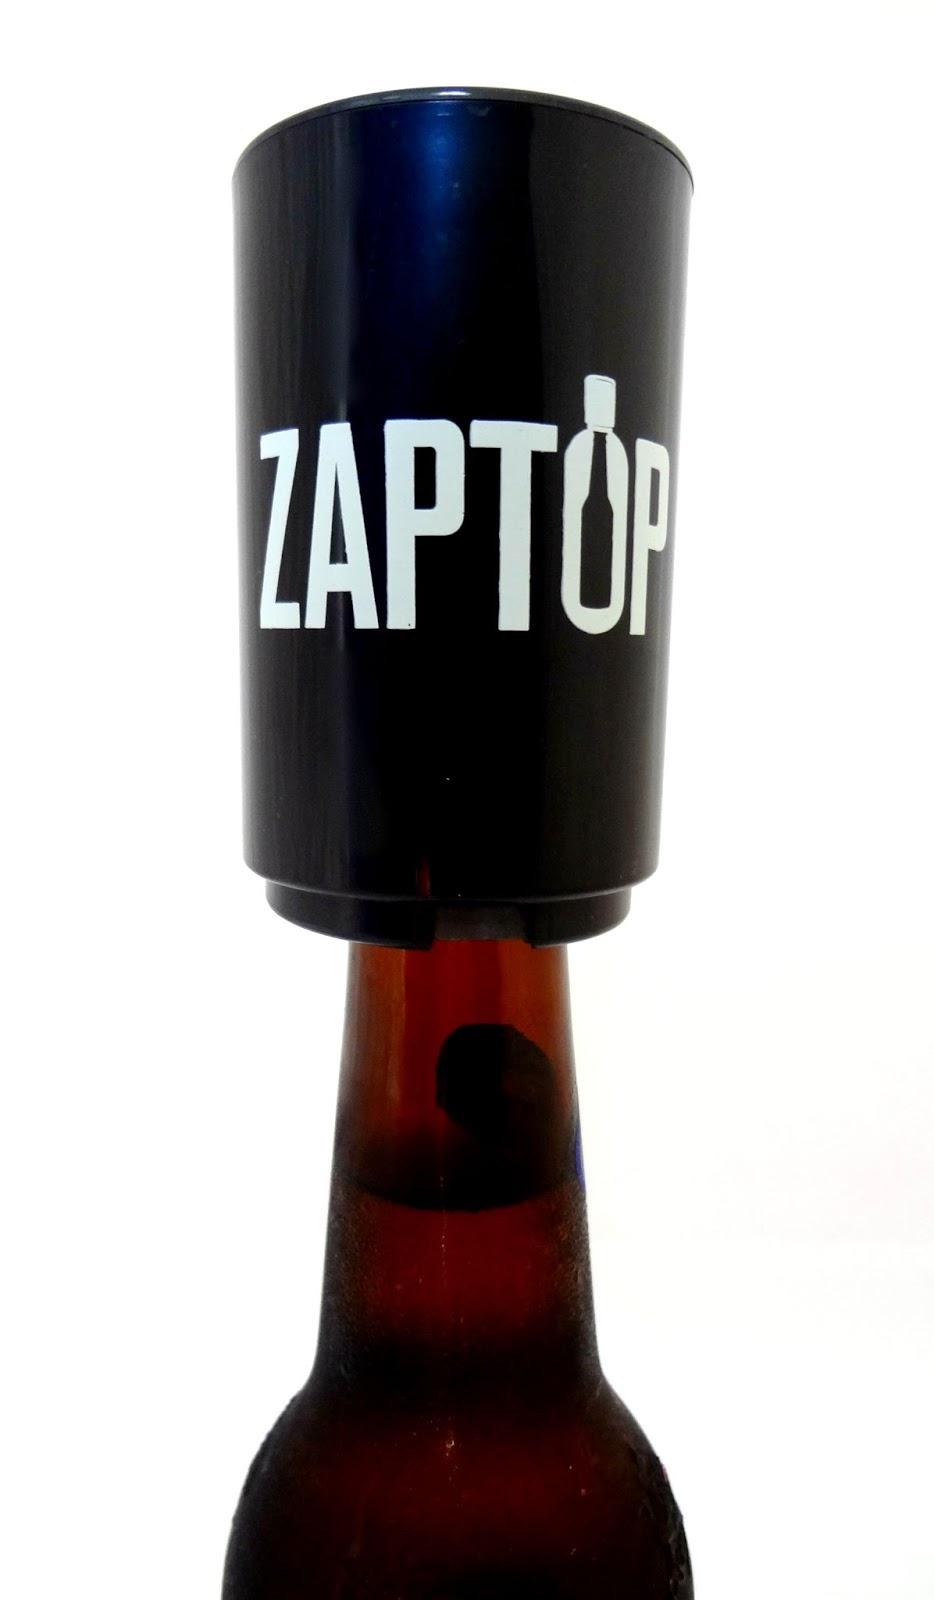 Simple Savings Zaptop Beer Bottle Opener Review